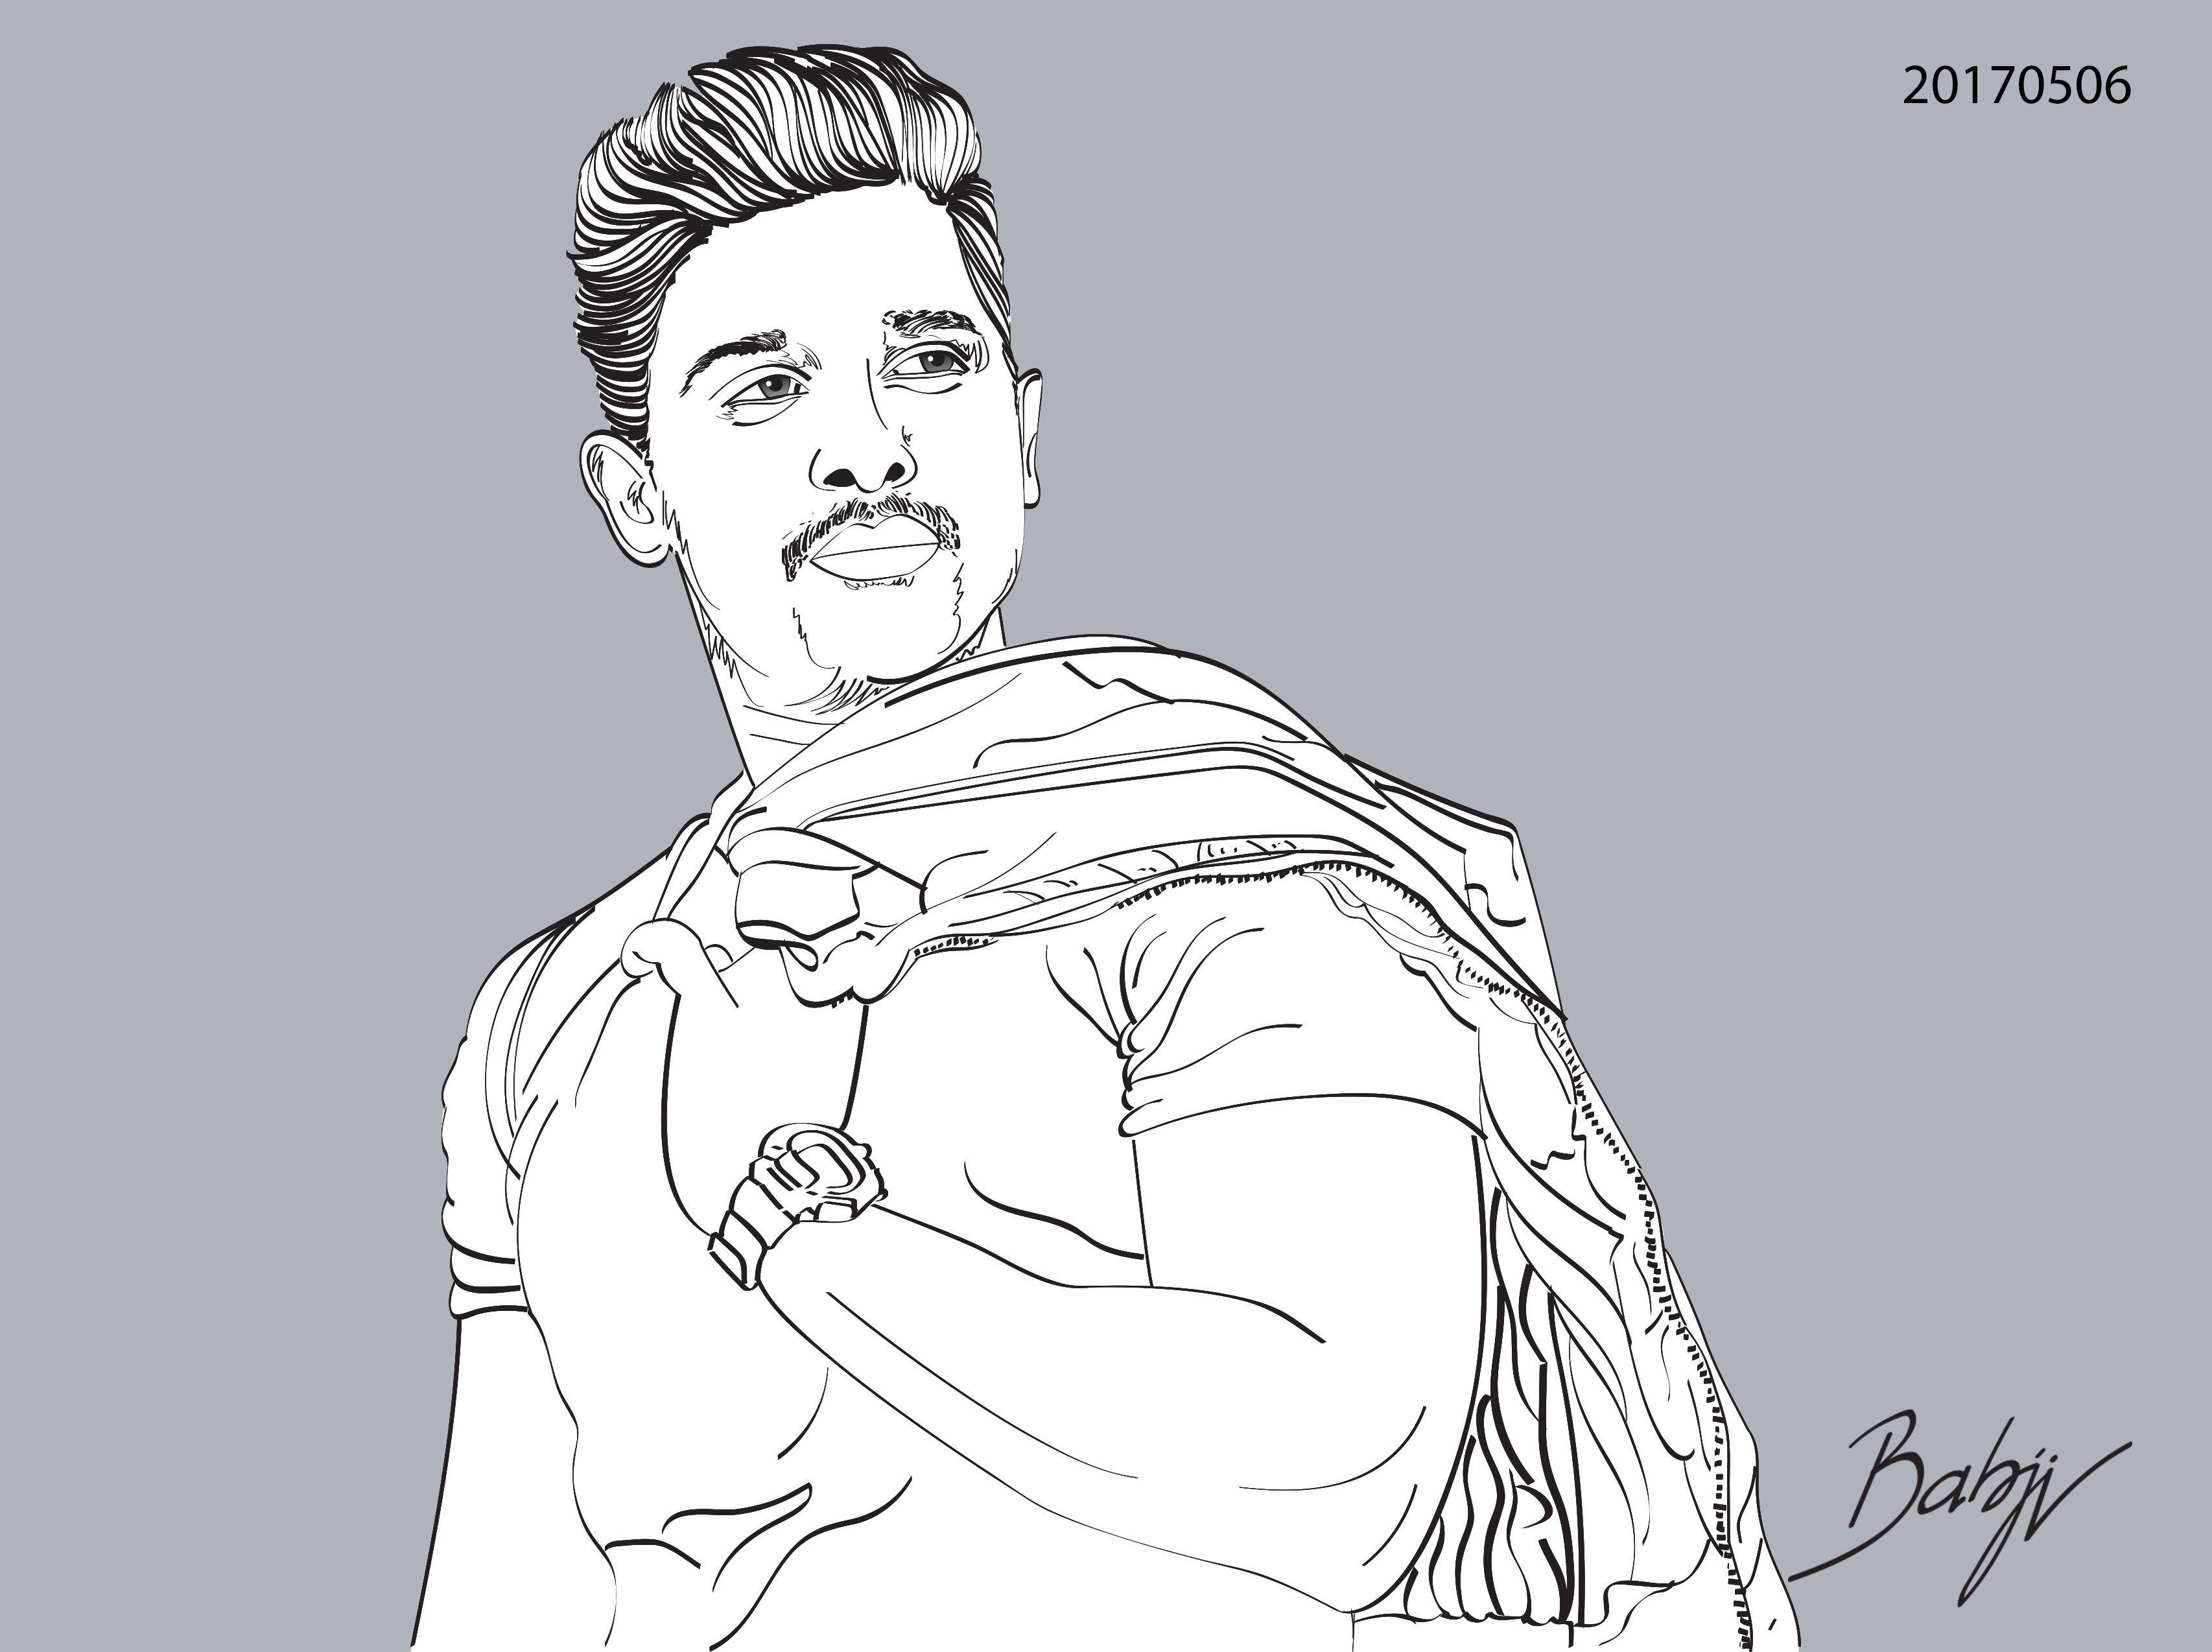 Allu arjun portrait drawings in 2019 pencil shading drawings